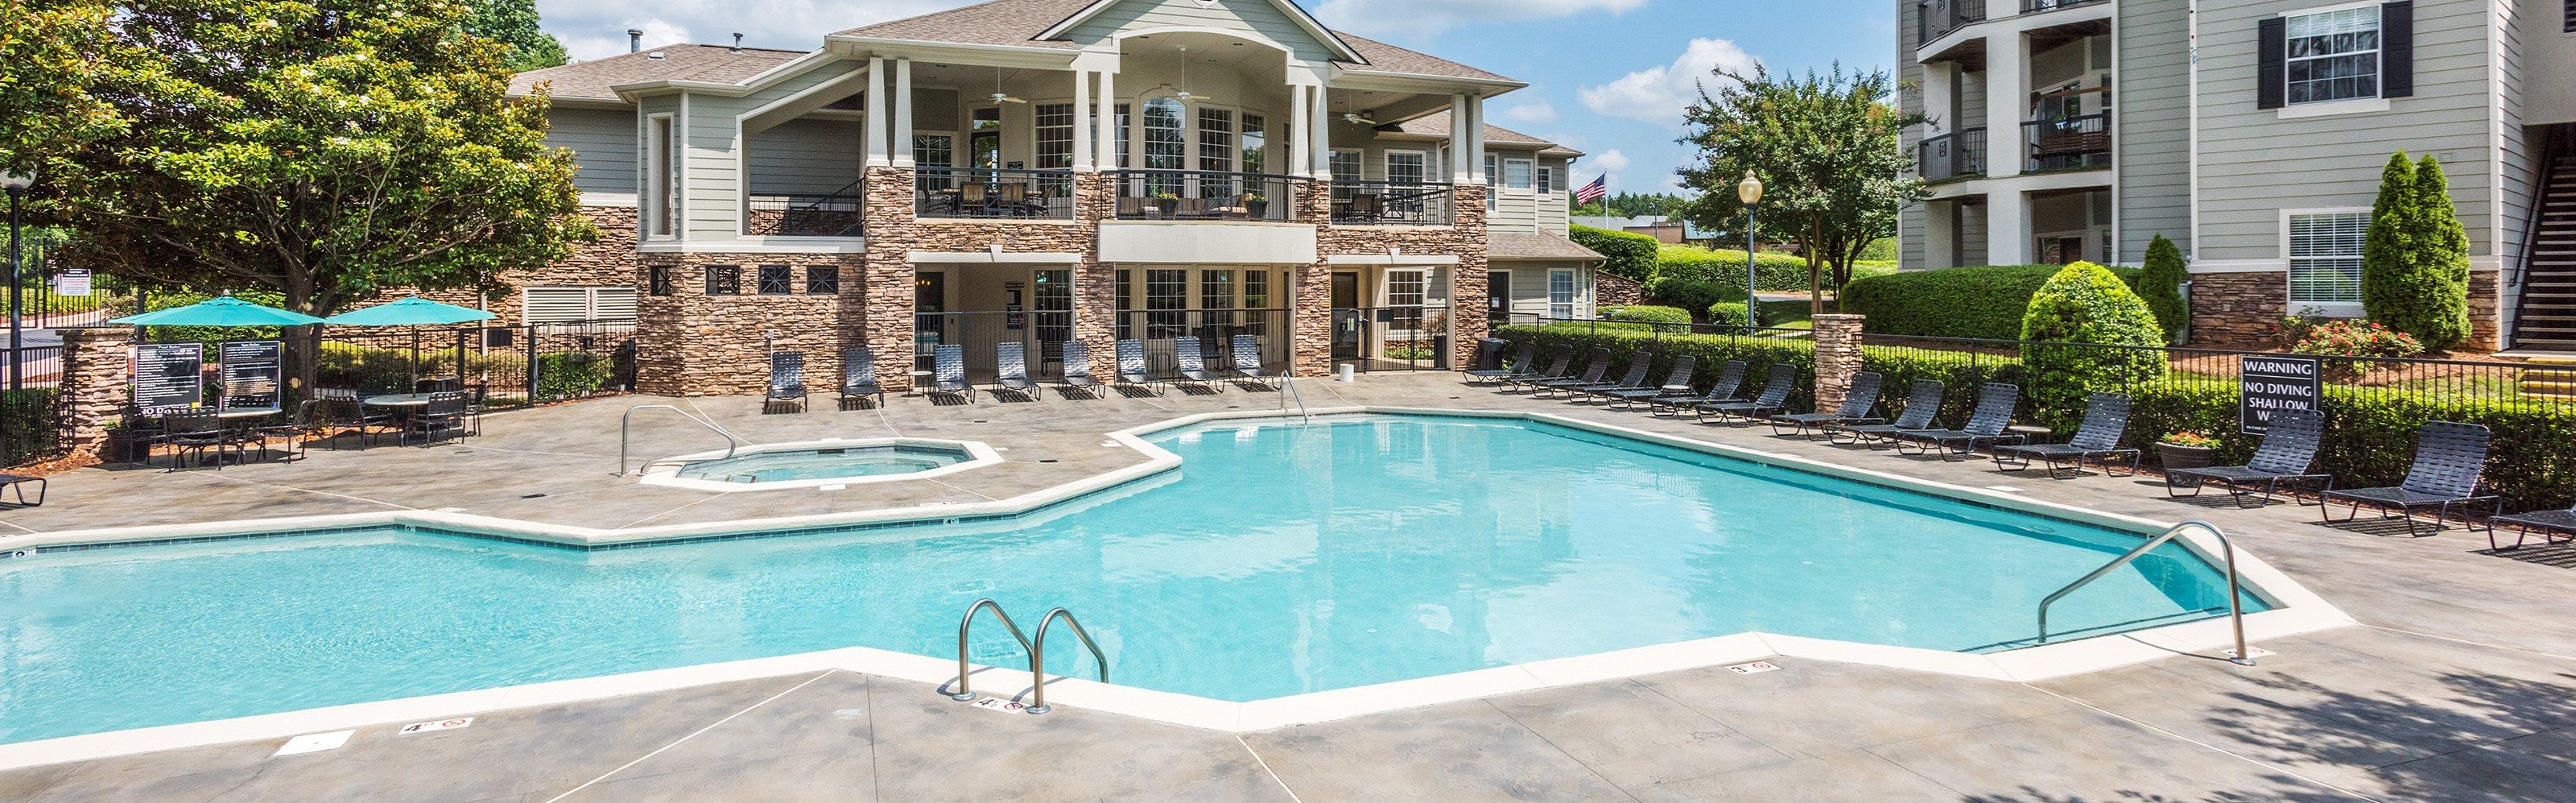 Cheswyck at Ballantyne Apartments pool area